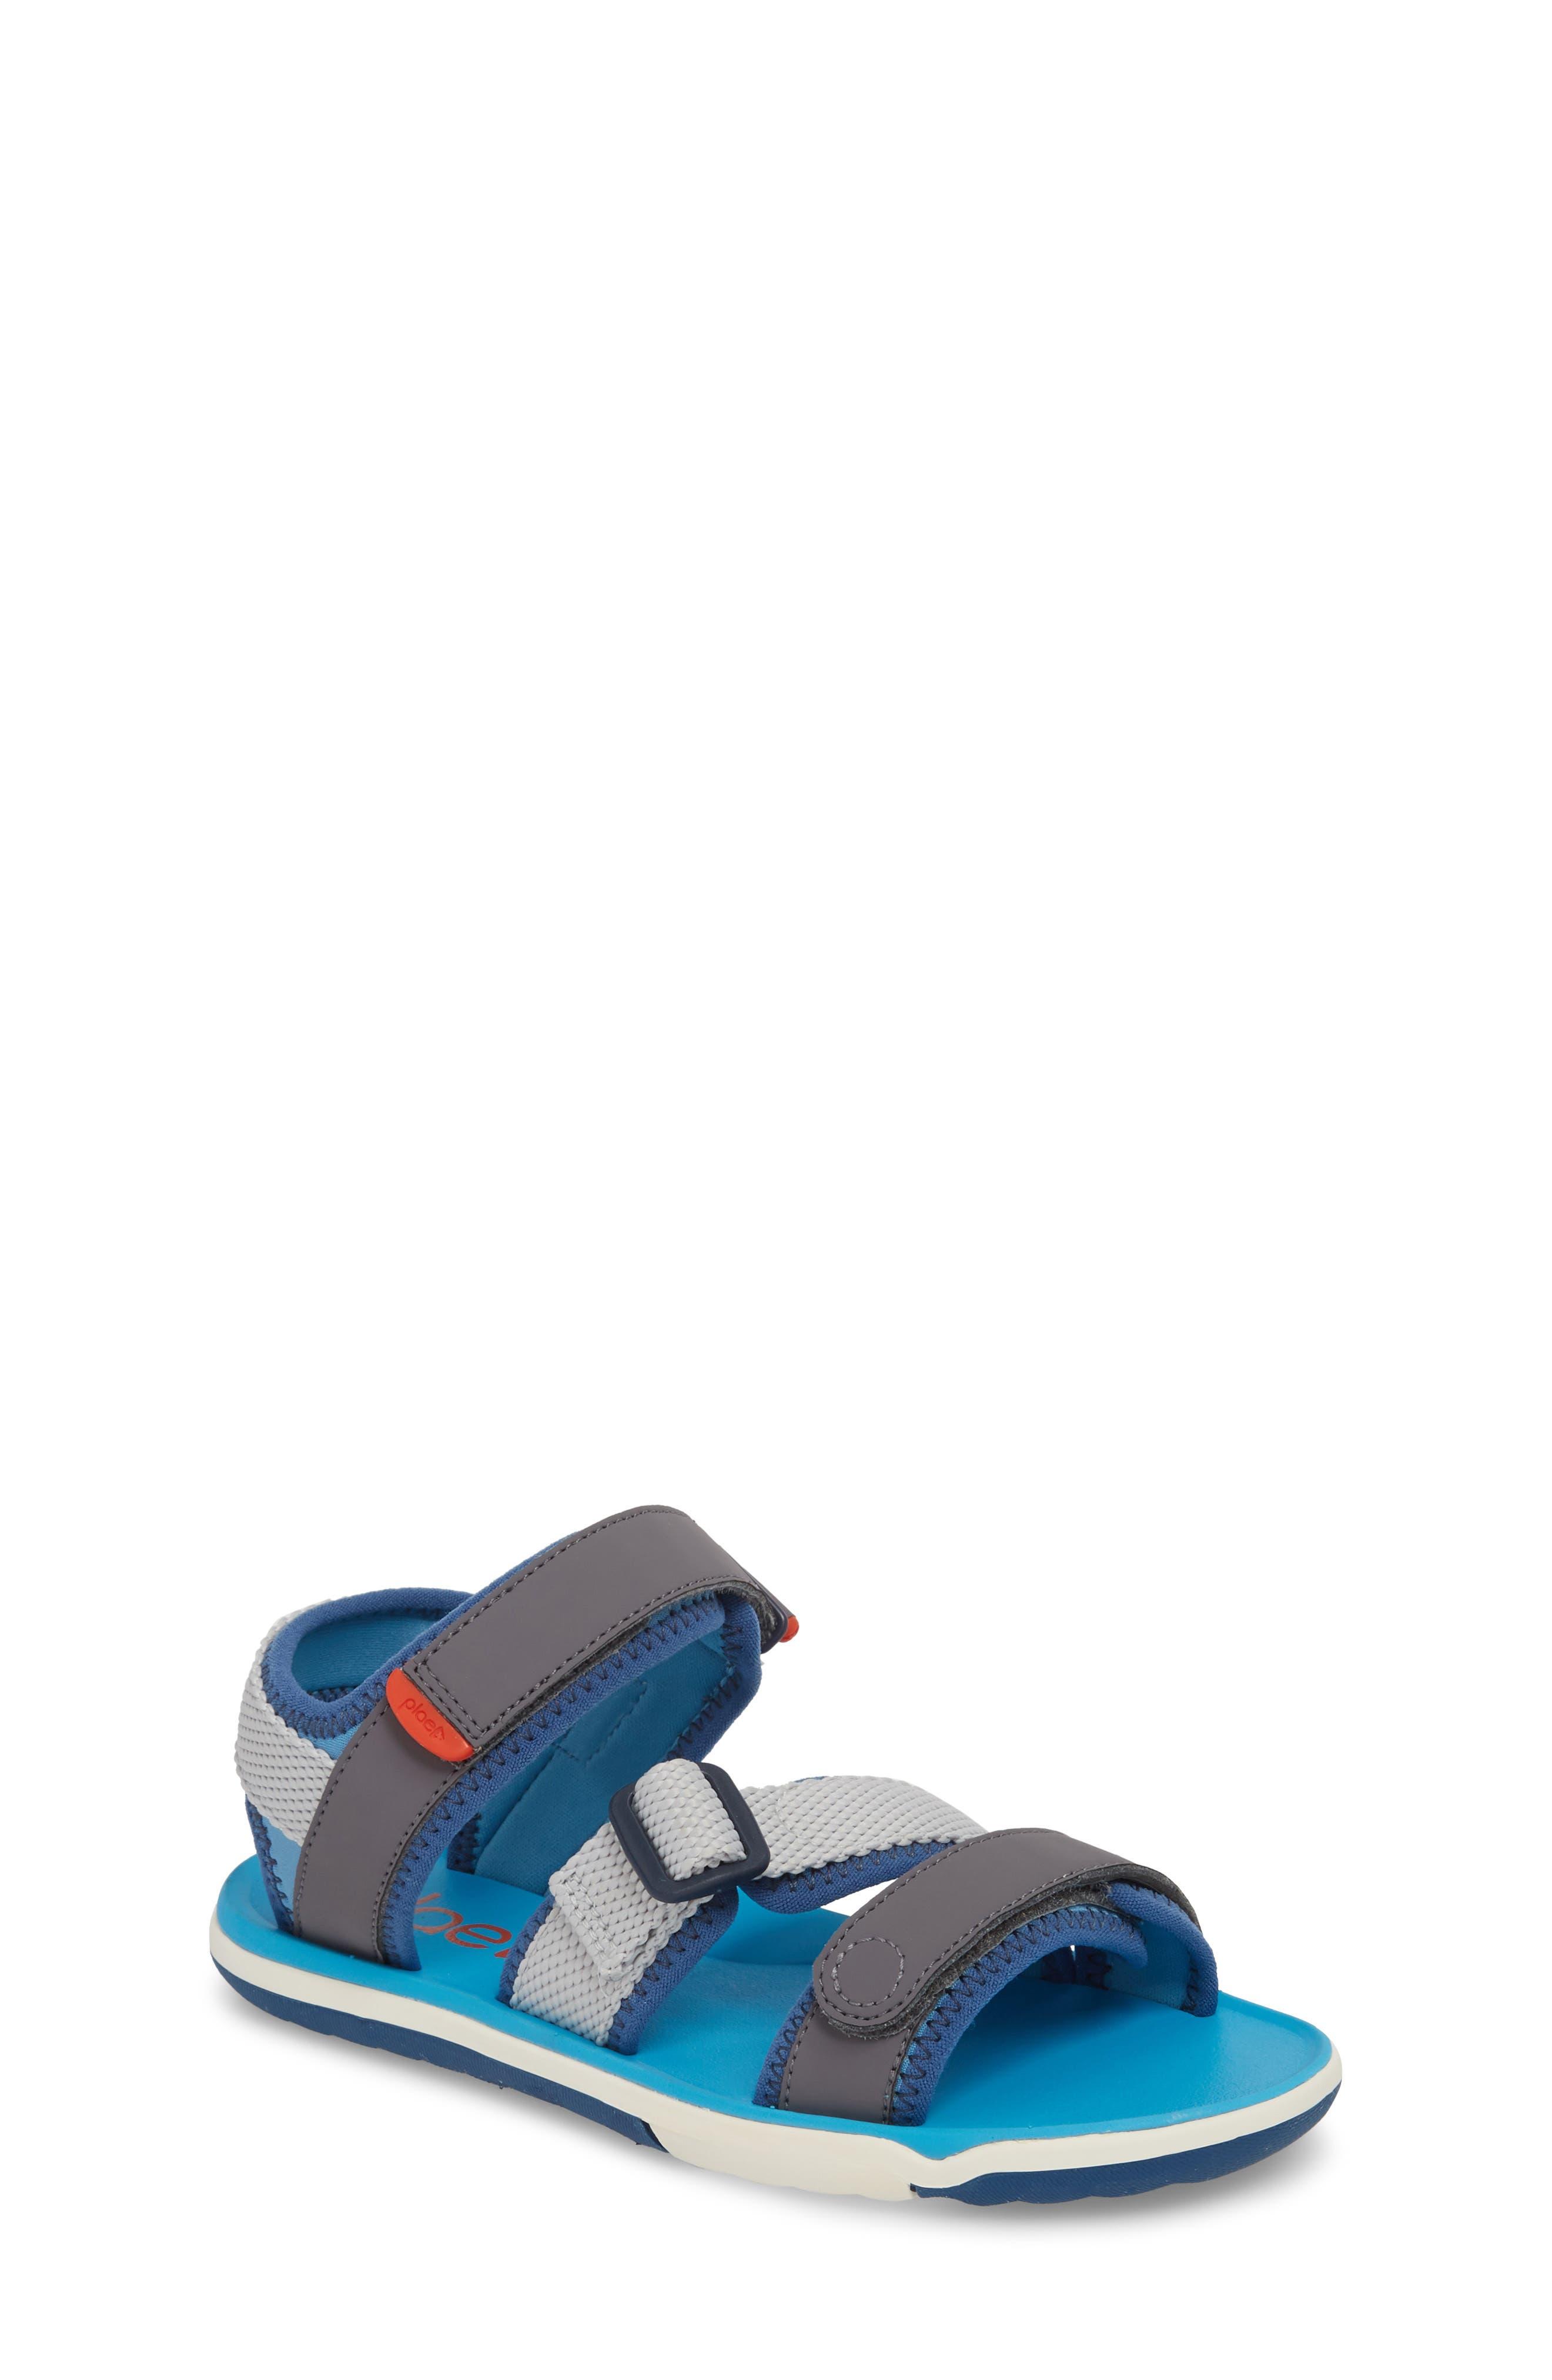 Wes Customizable Sandal,                             Main thumbnail 1, color,                             421